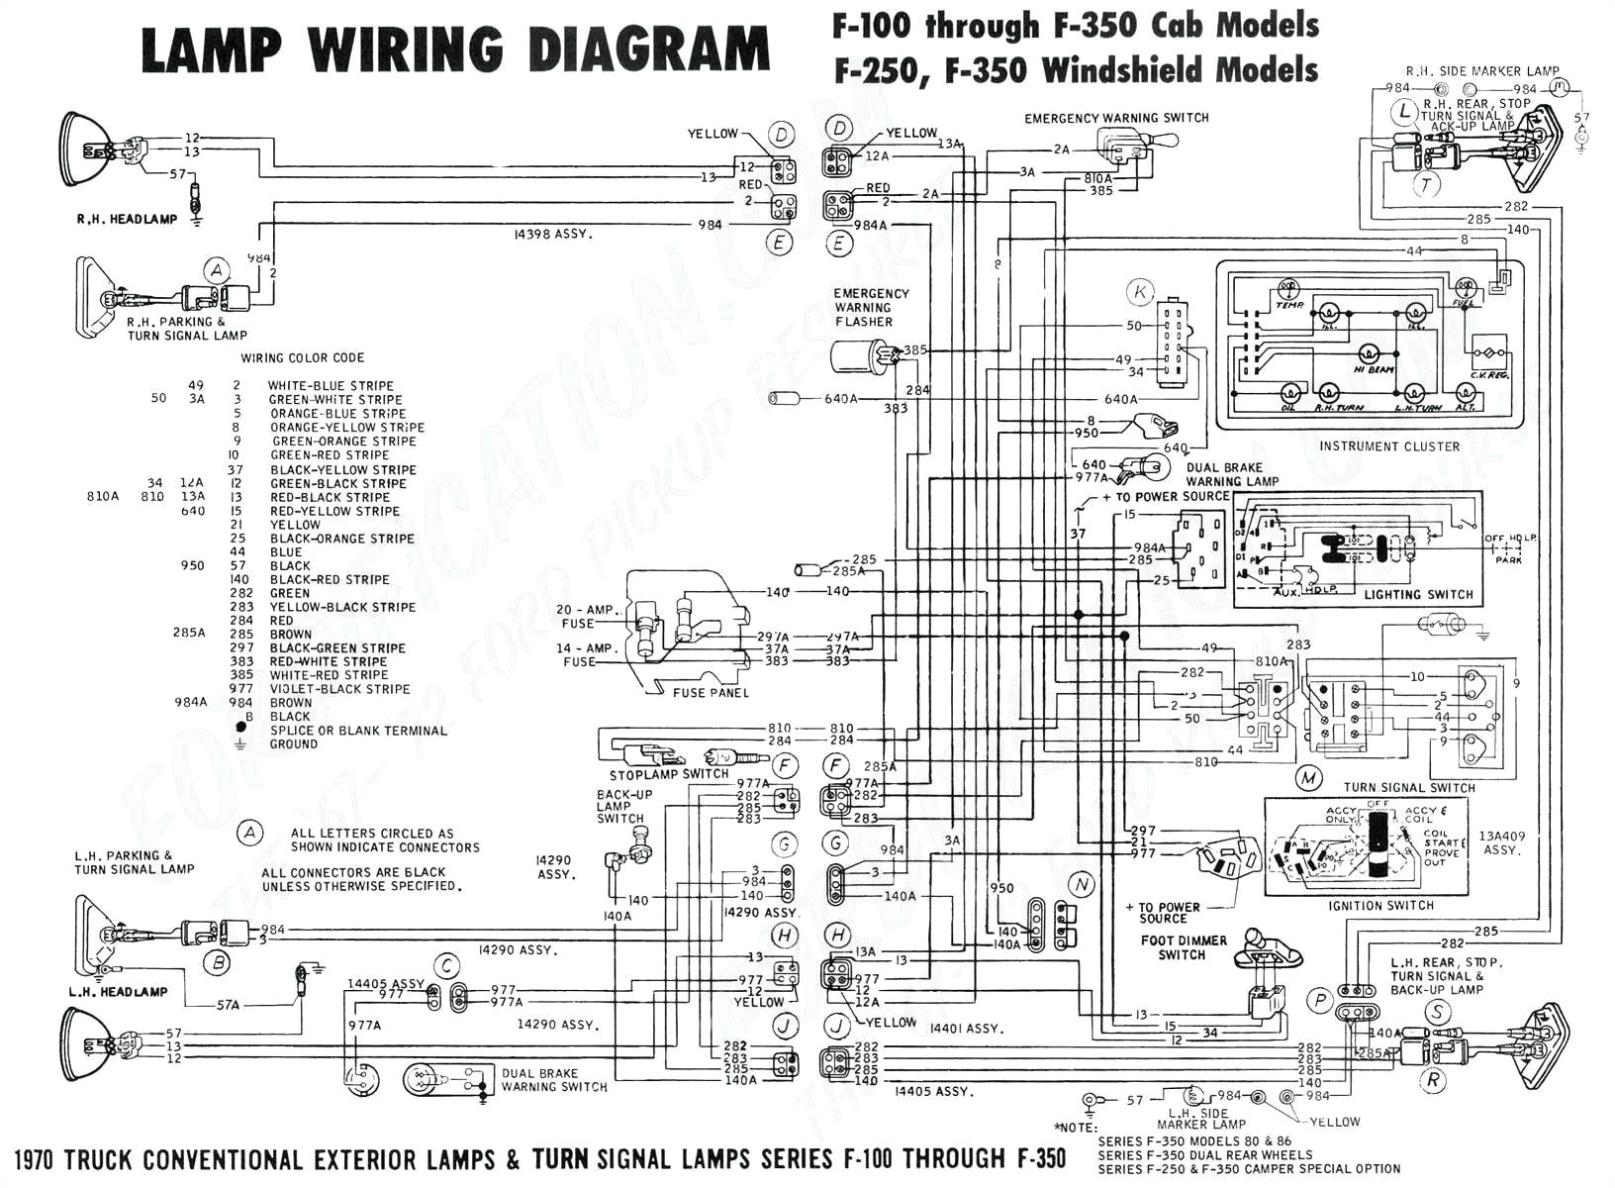 free download electric guitar wiring diagram wiring diagram free download guitar wiring schematics